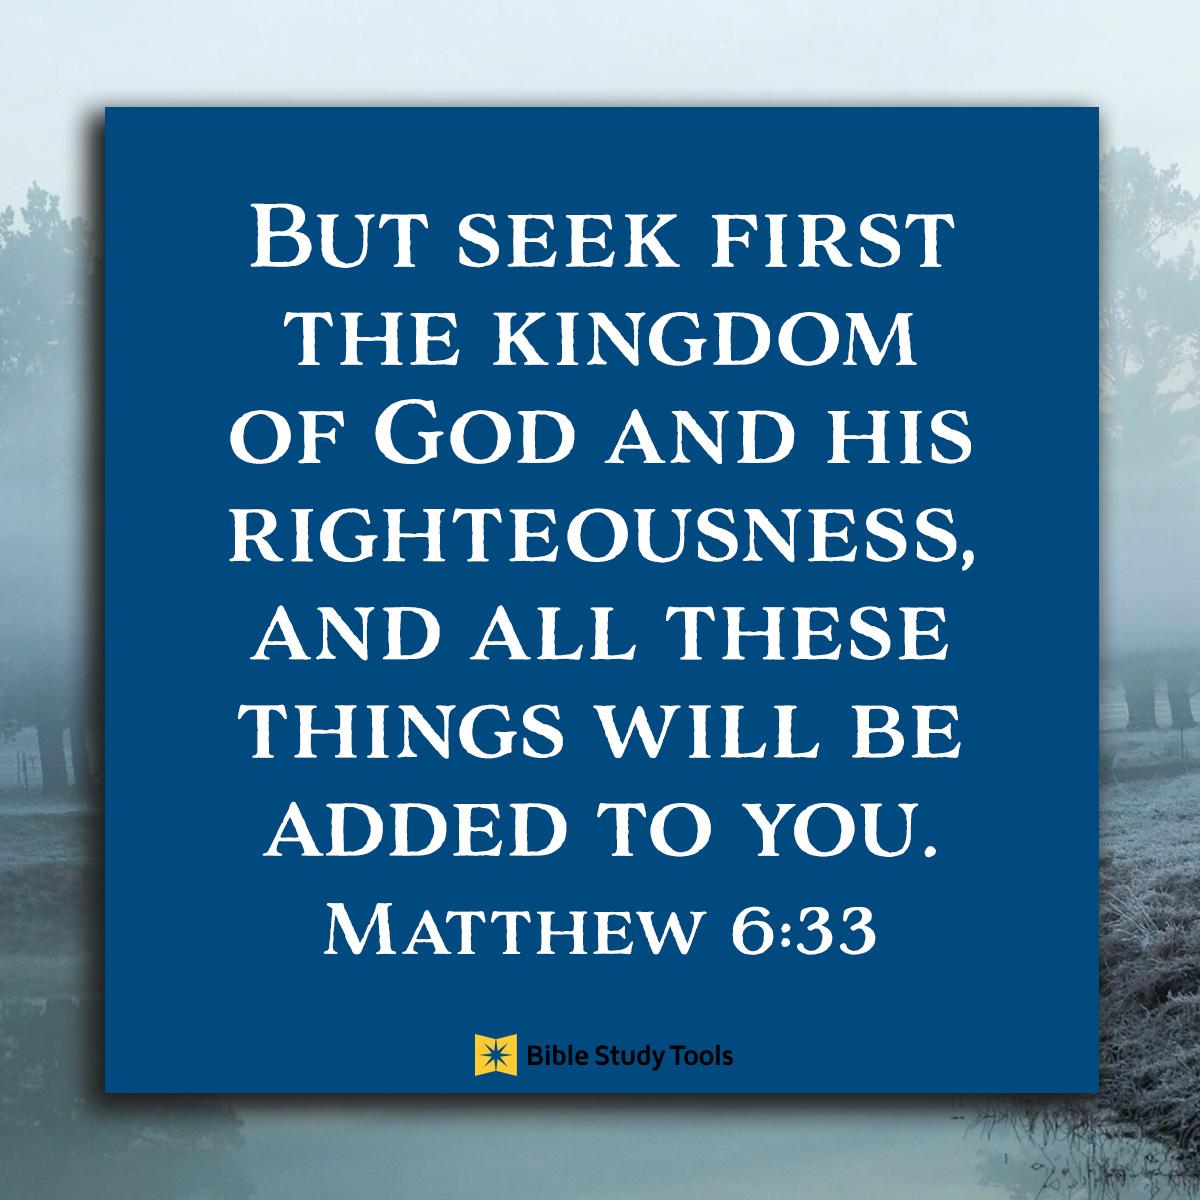 Matthew 6:33, inspirational image